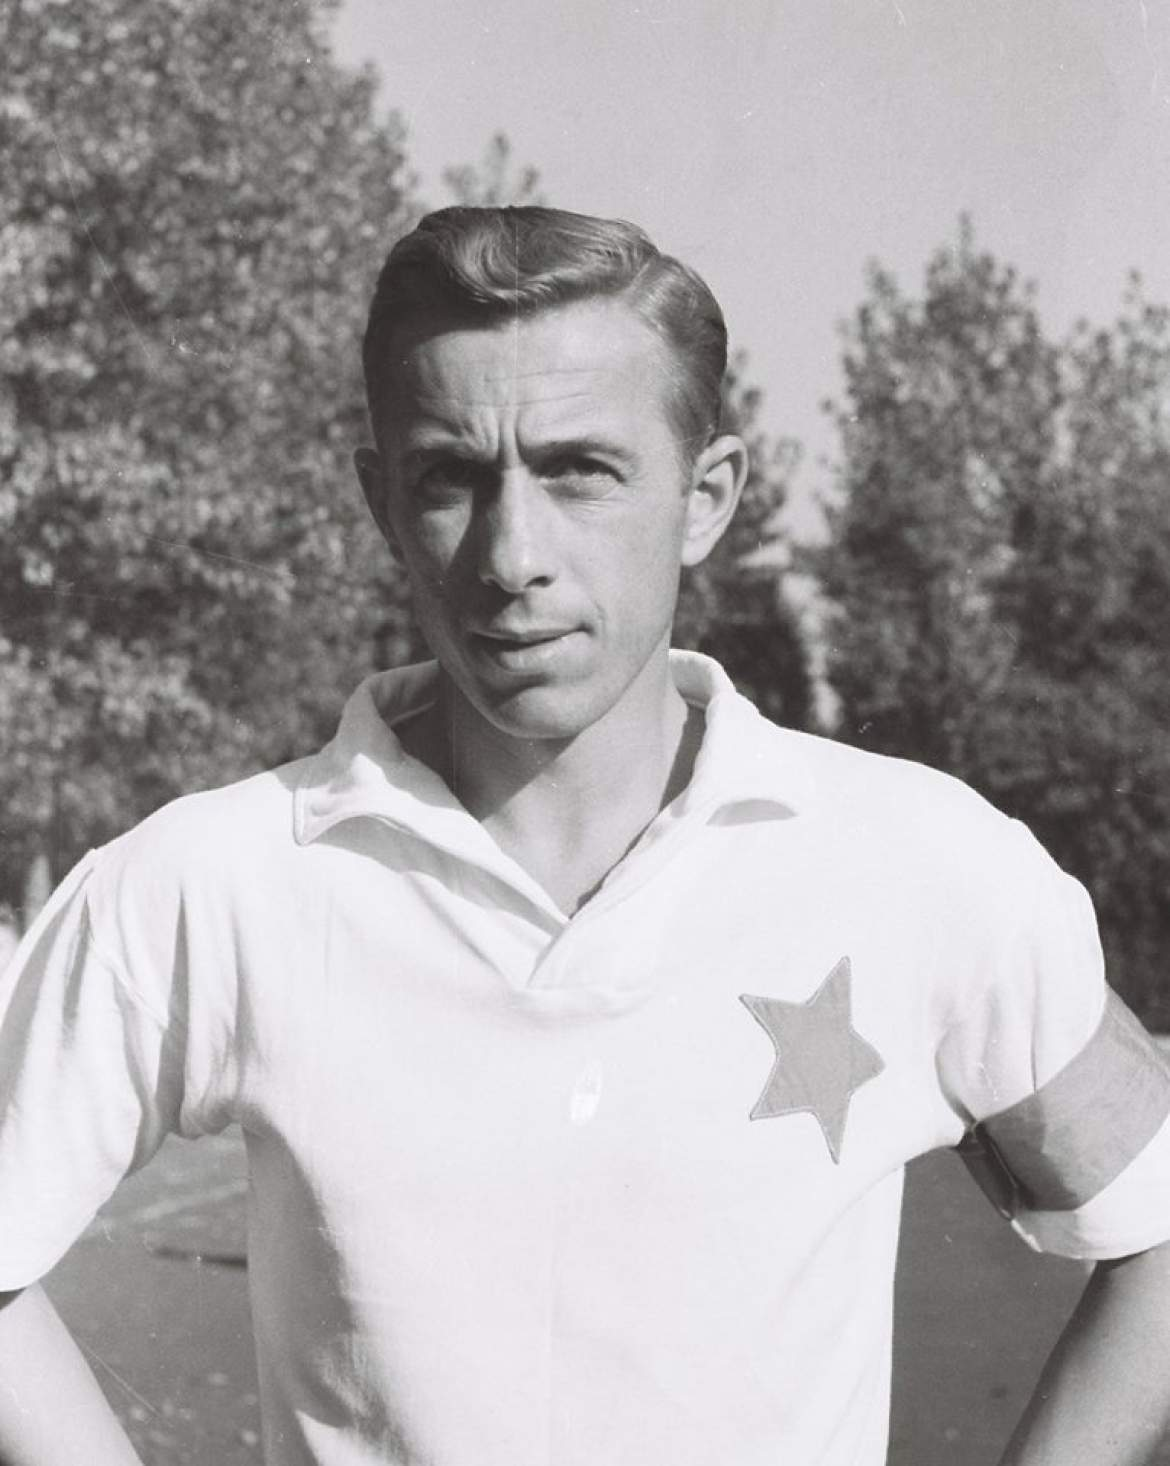 Yellow Dog: Croatia's first superstar